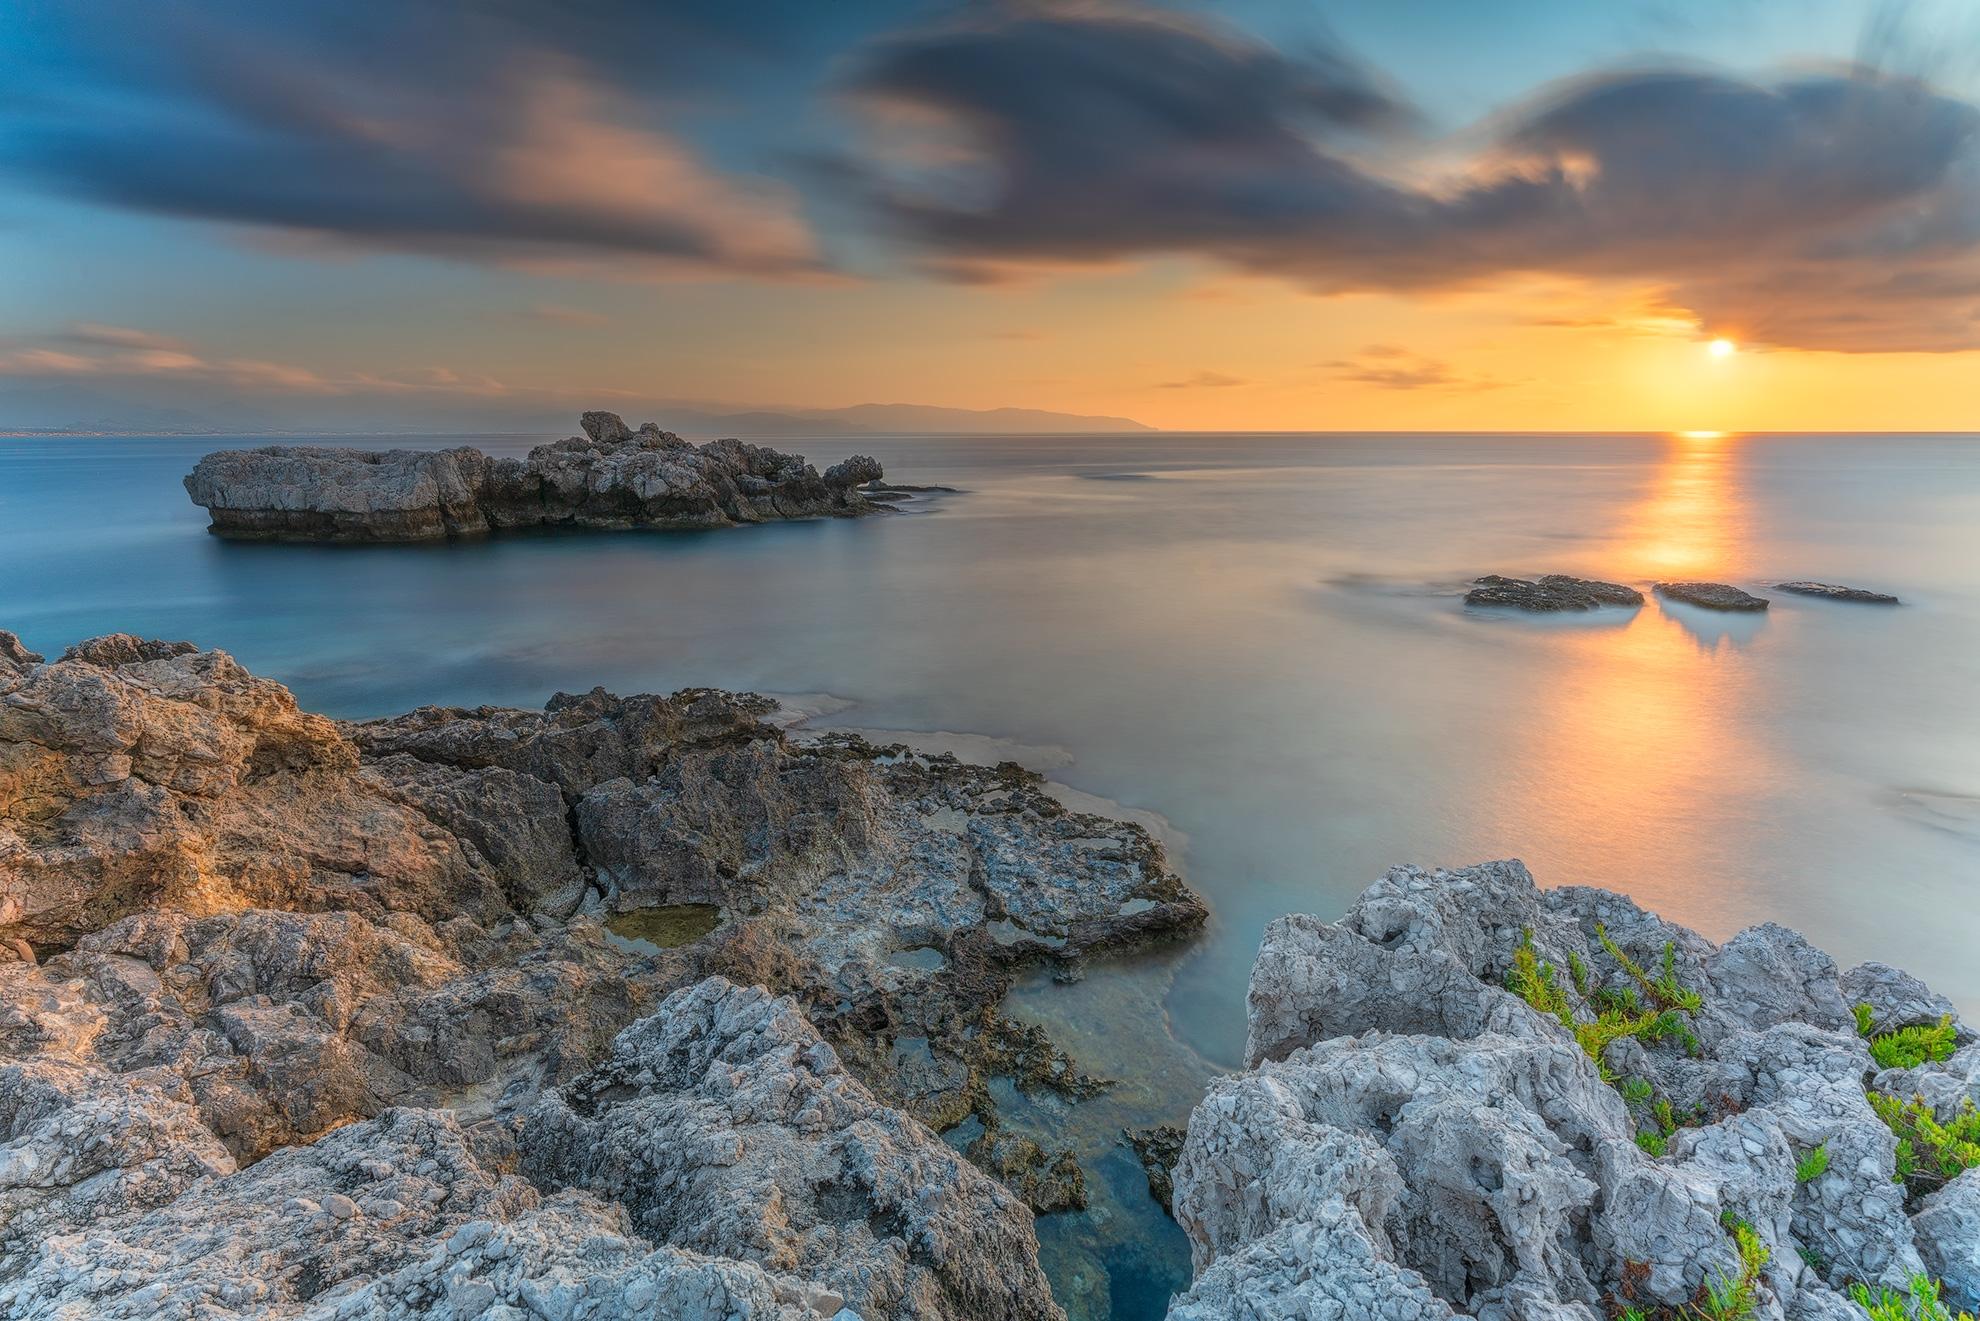 Capo Milazzo at sunset ...